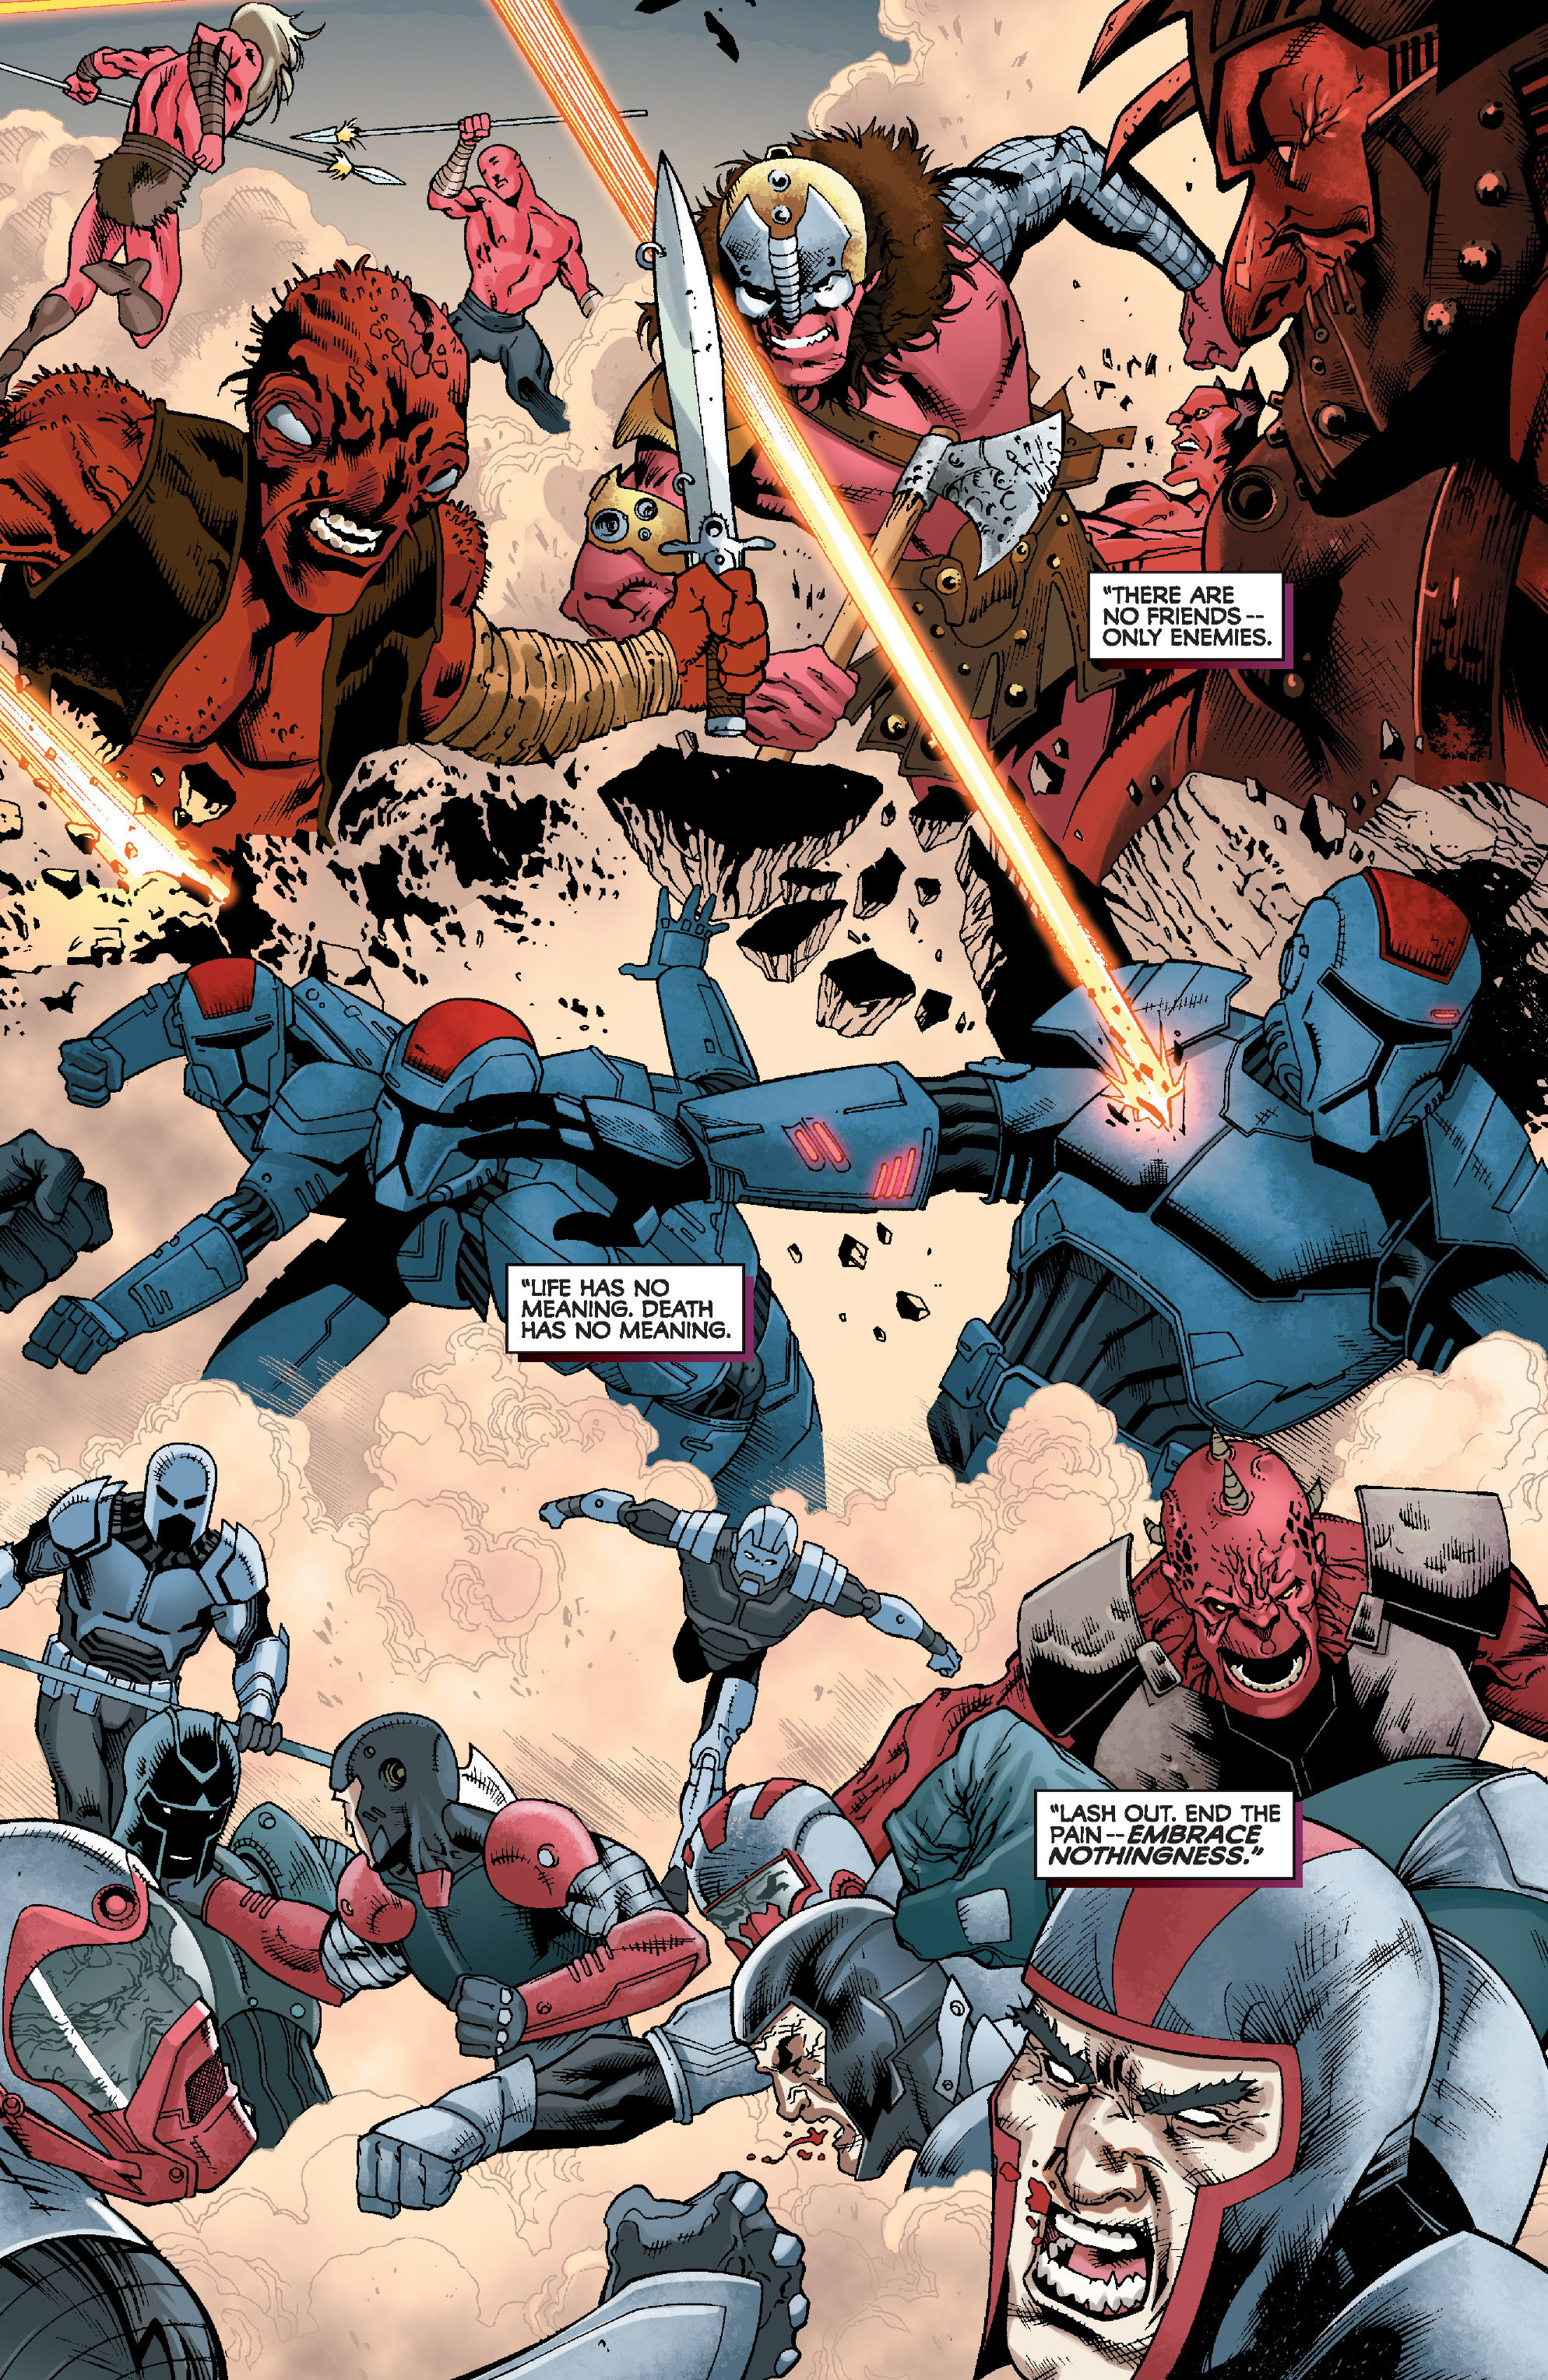 Read online Star Wars: Knight Errant - Escape comic -  Issue #4 - 12